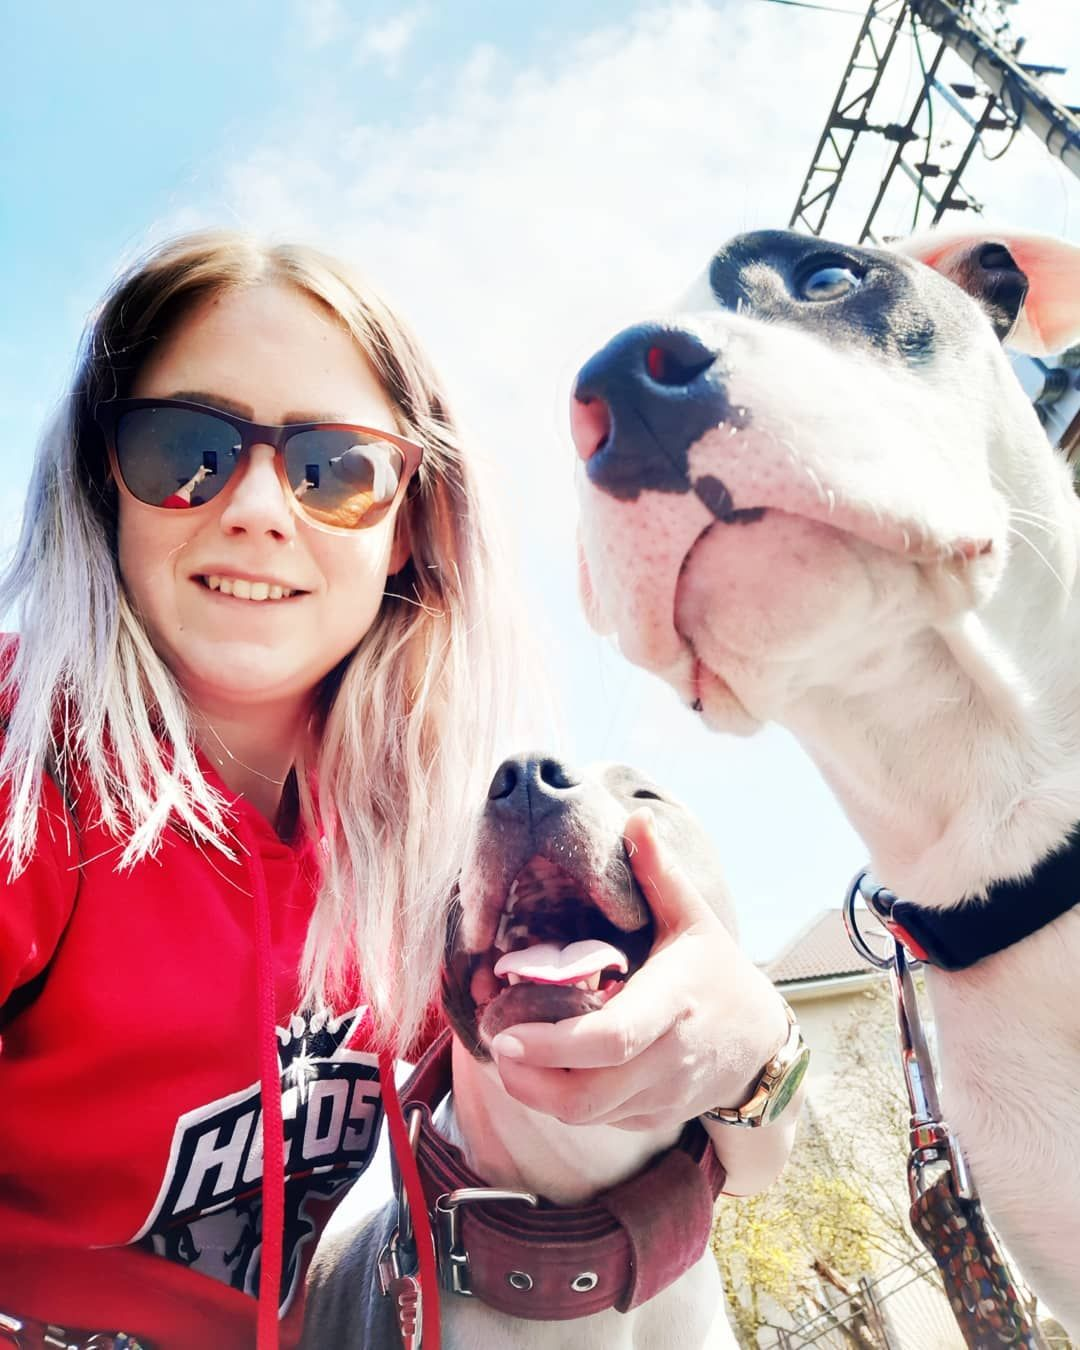 [New] The 10 Best Home Decor (with Pictures) -  mavisbrad #selfie #amstaff #staffords #amerikanstaffordshirenterrieri #lovedogs #loveamstaff #sun #sunday #nature #banskabystrica #slovakdog #slovakgirl #slovakia #slovakianature #sasova